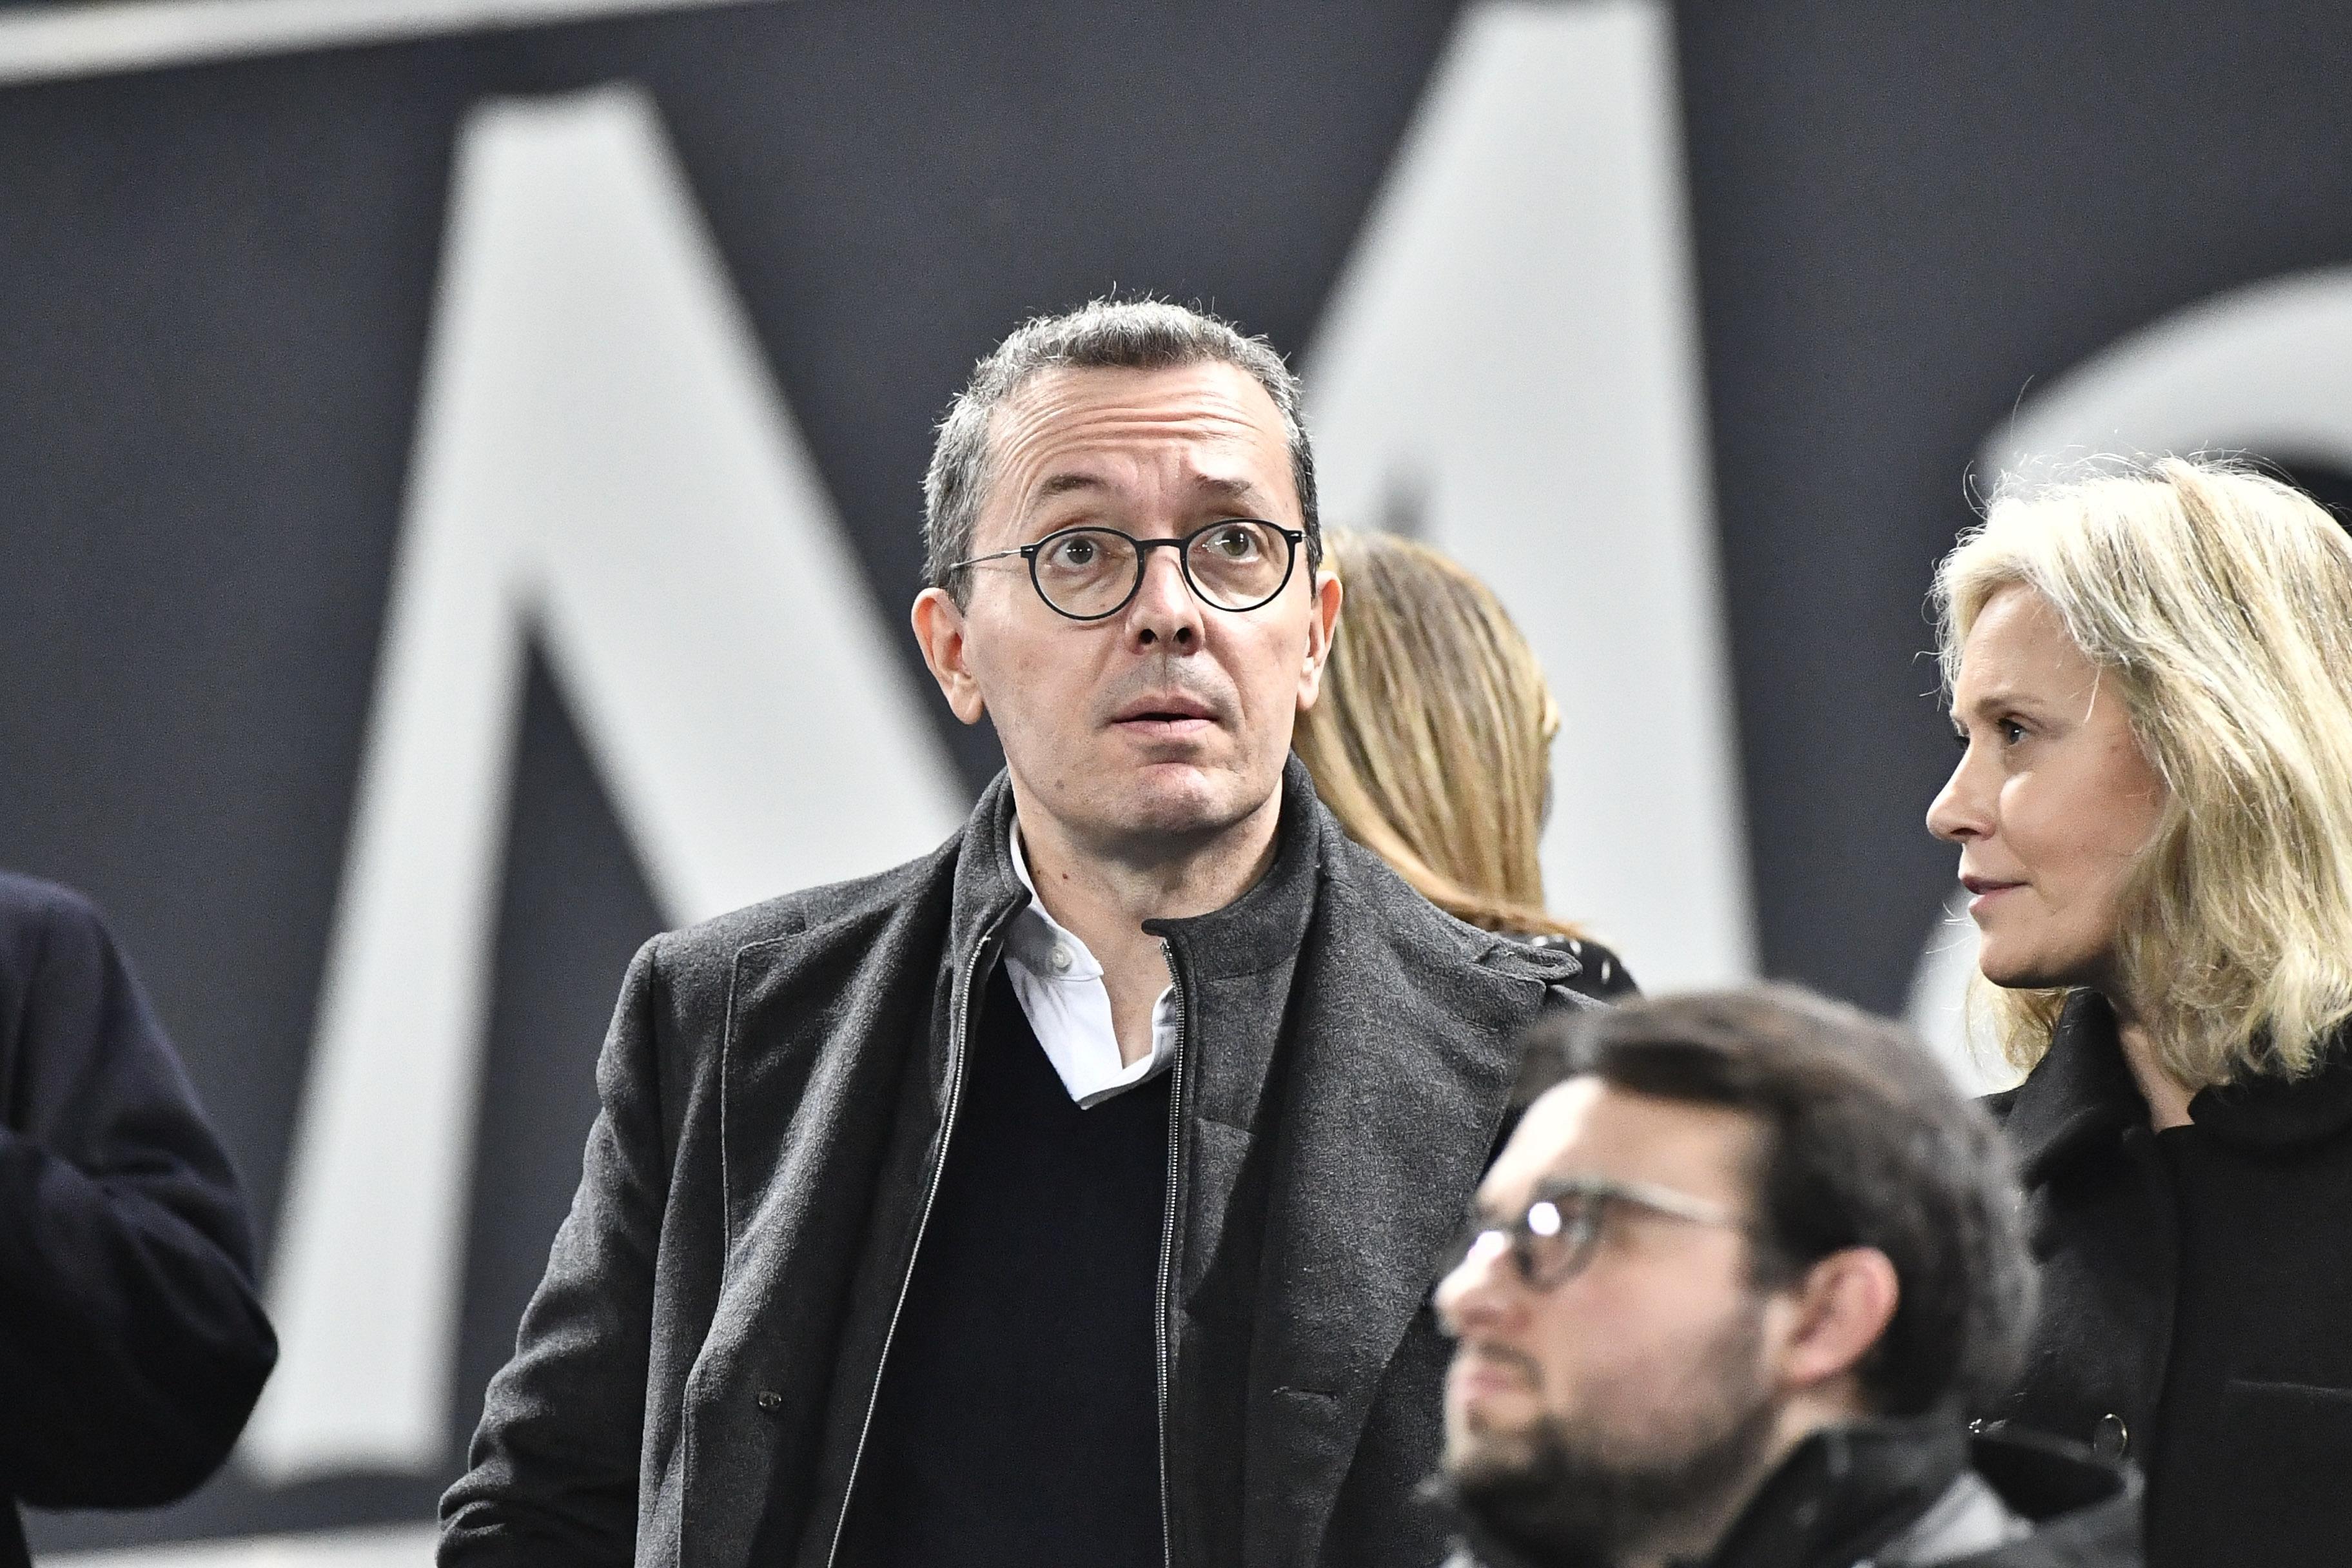 Football - Ligue 1 - Marseille: Eyraud face aux vents contraires